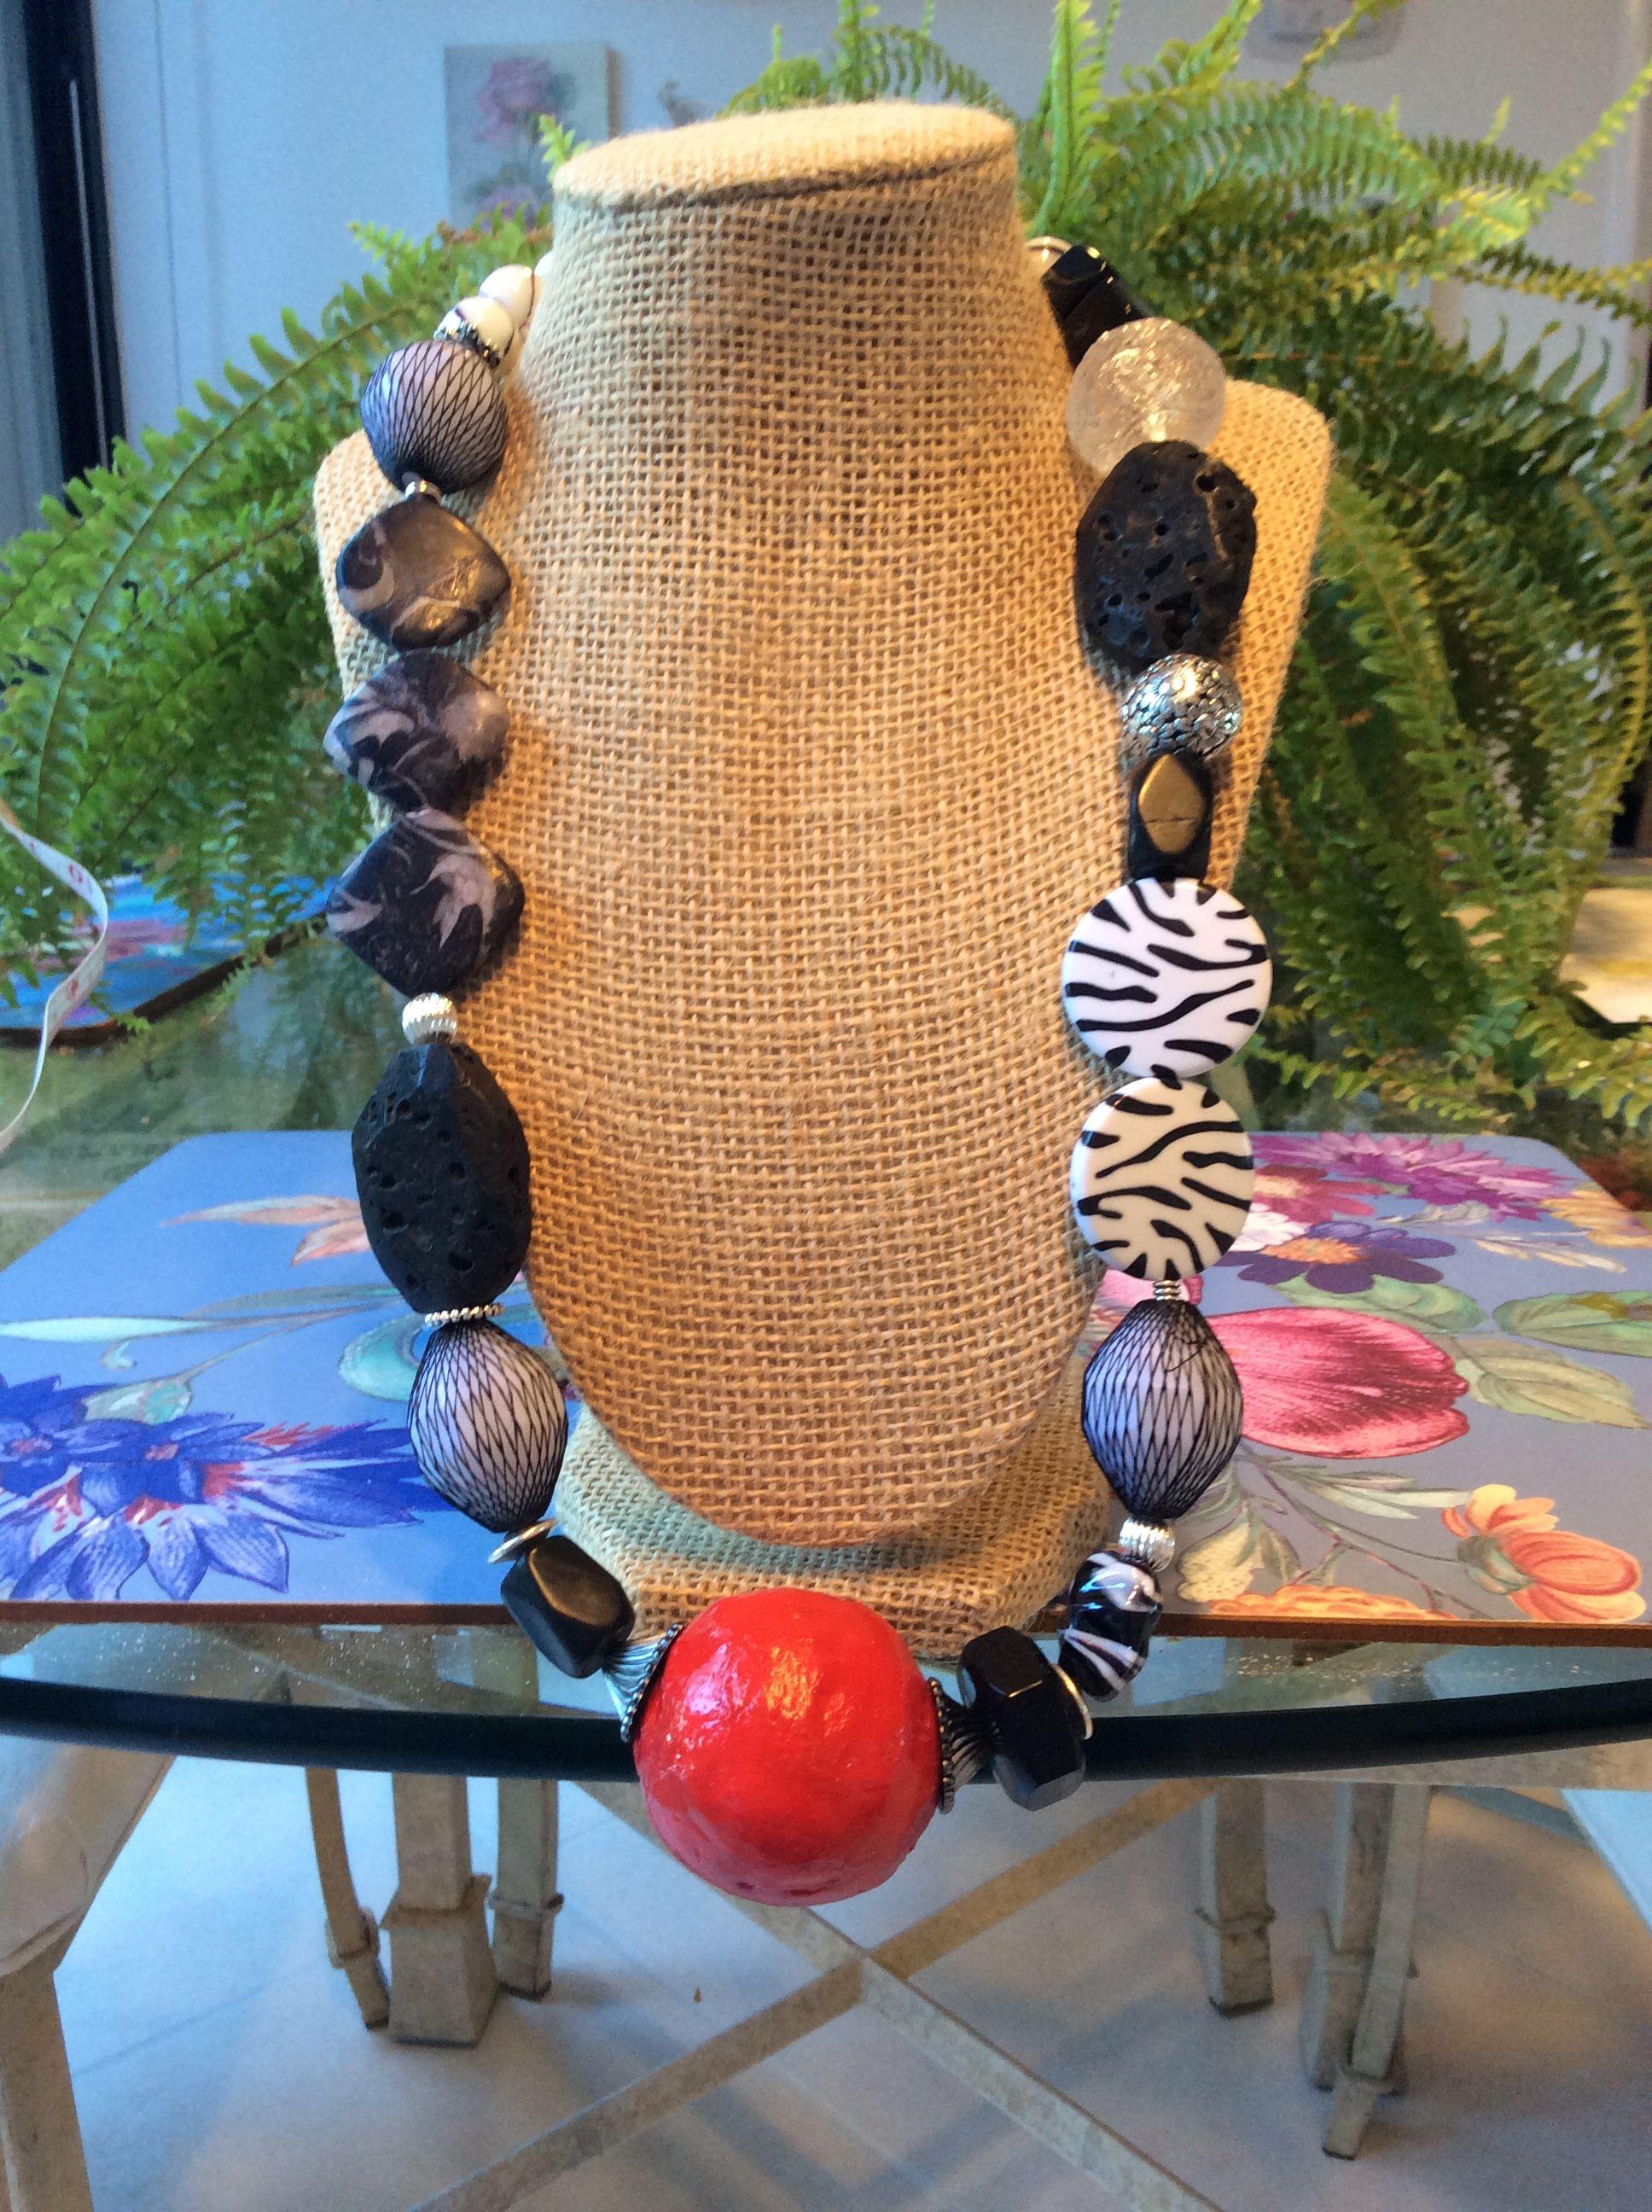 ON SALE-$25 go to etsy.com lauraforstartjewelry